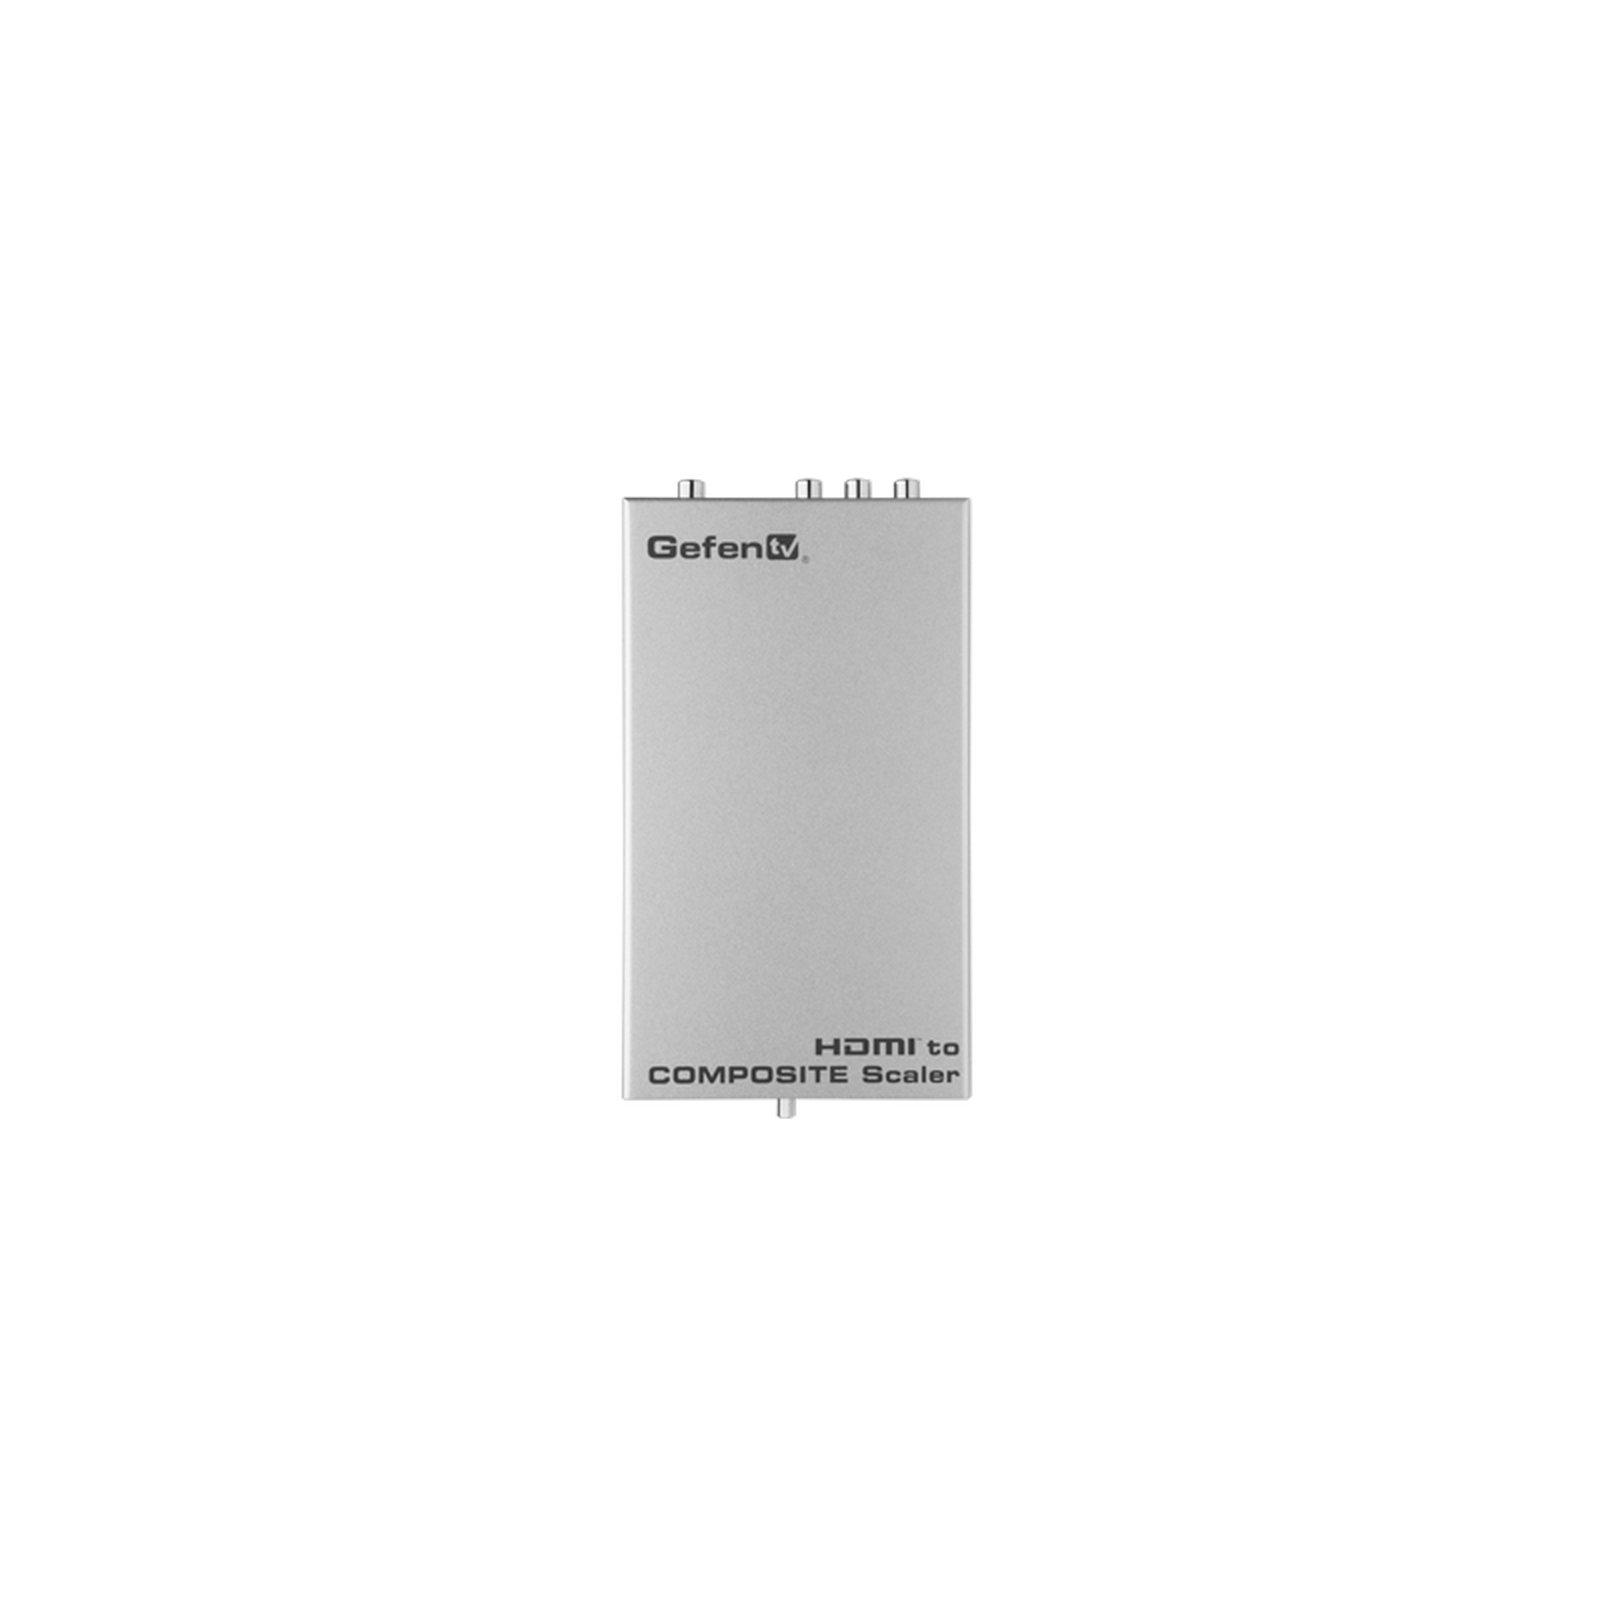 Gefen GTV-HDMI-2-COMPSVIDSN | HDMI to Composite S Video Converter